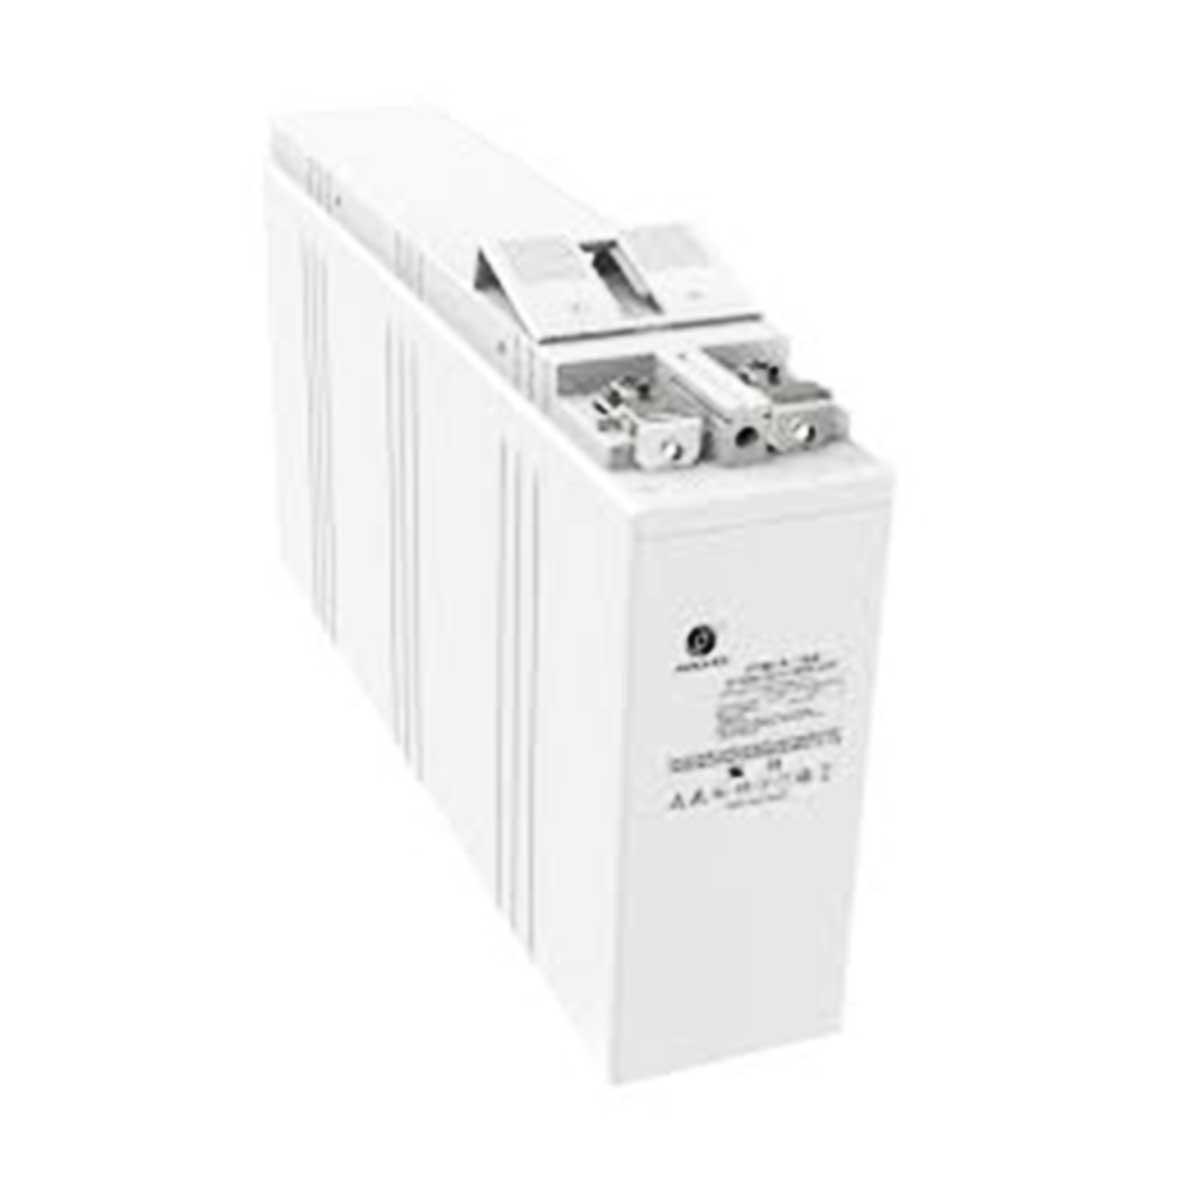 Batería plomo acido válvula regulada Santak FTB12-150 12V 150Ah